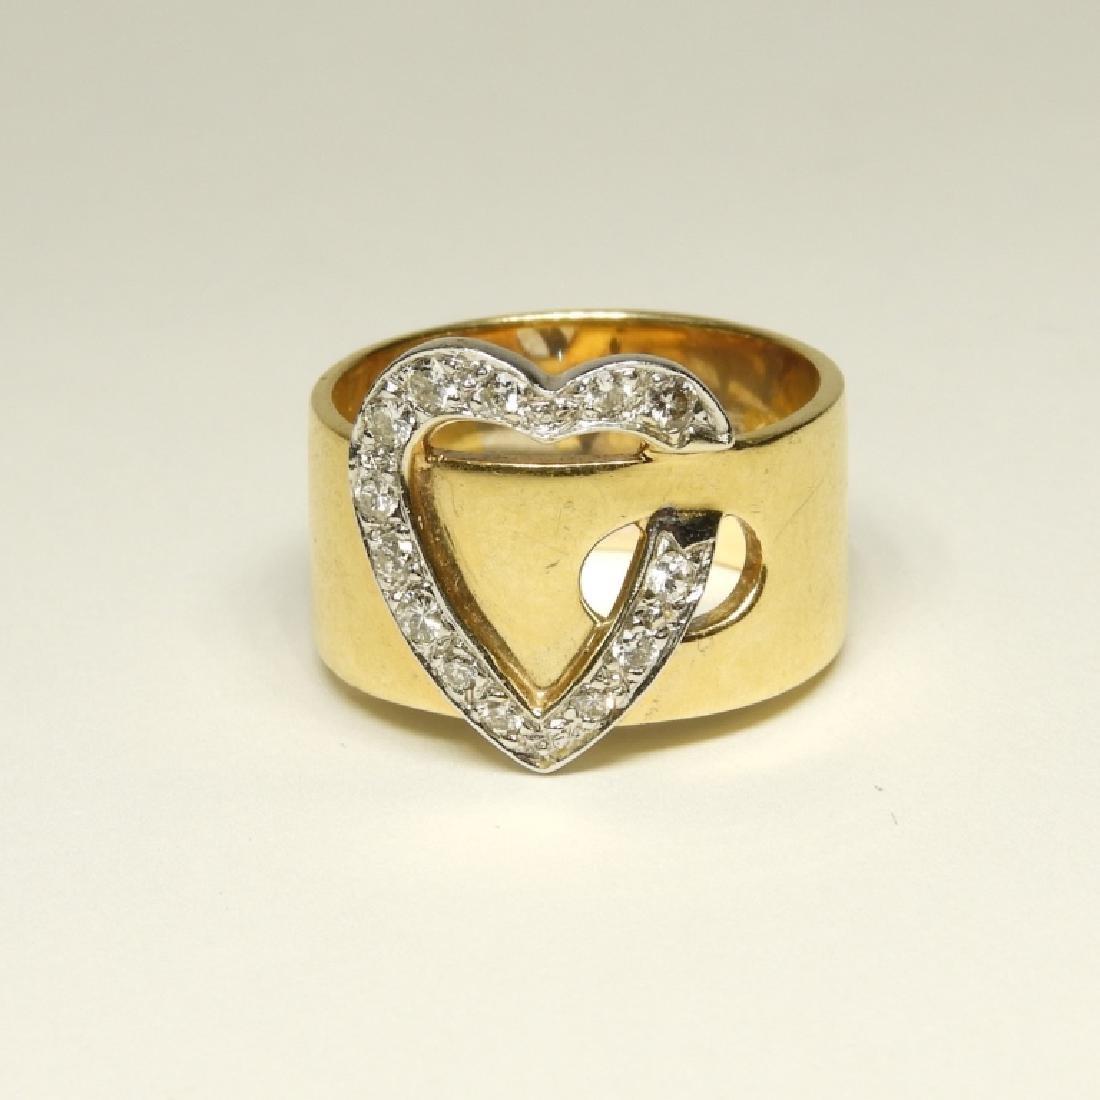 14K Gold Diamond Heart Belt Form Lady's Ring